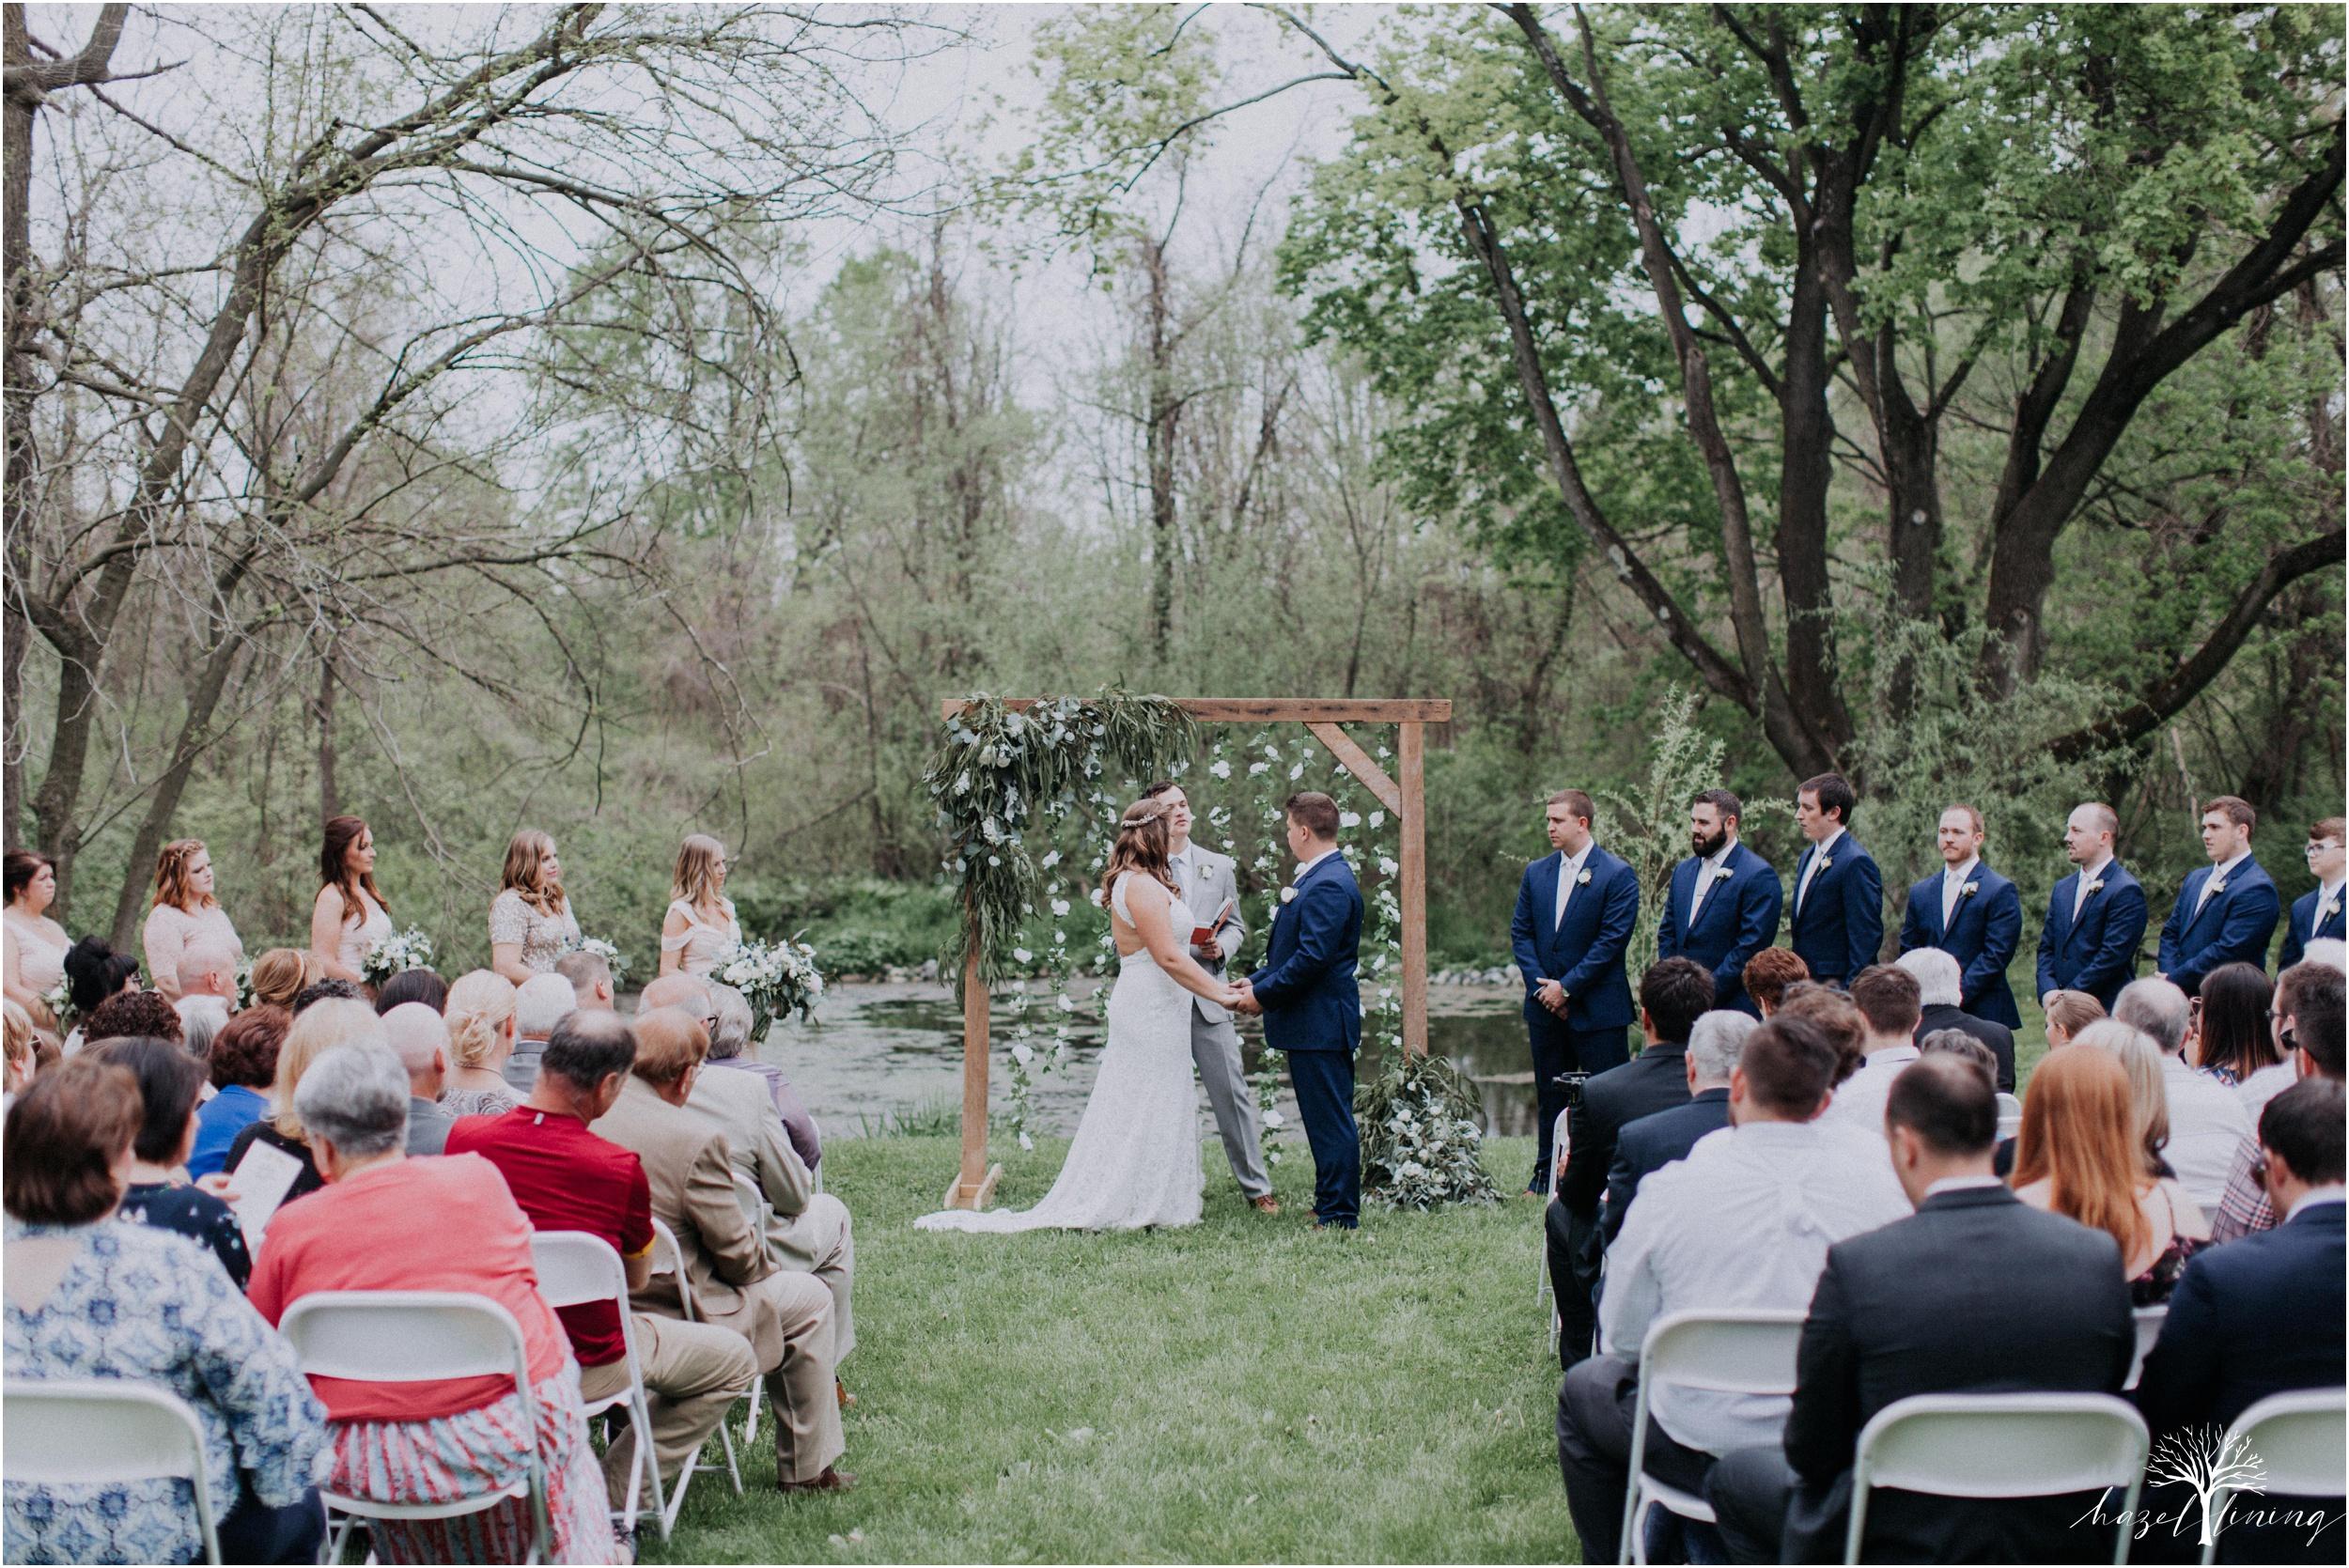 hazel-lining-travel-wedding-elopement-photography-abby-skyler-hunt-the-willis-house-york-pennsylvania-outdoor-estate-wedding_0086.jpg